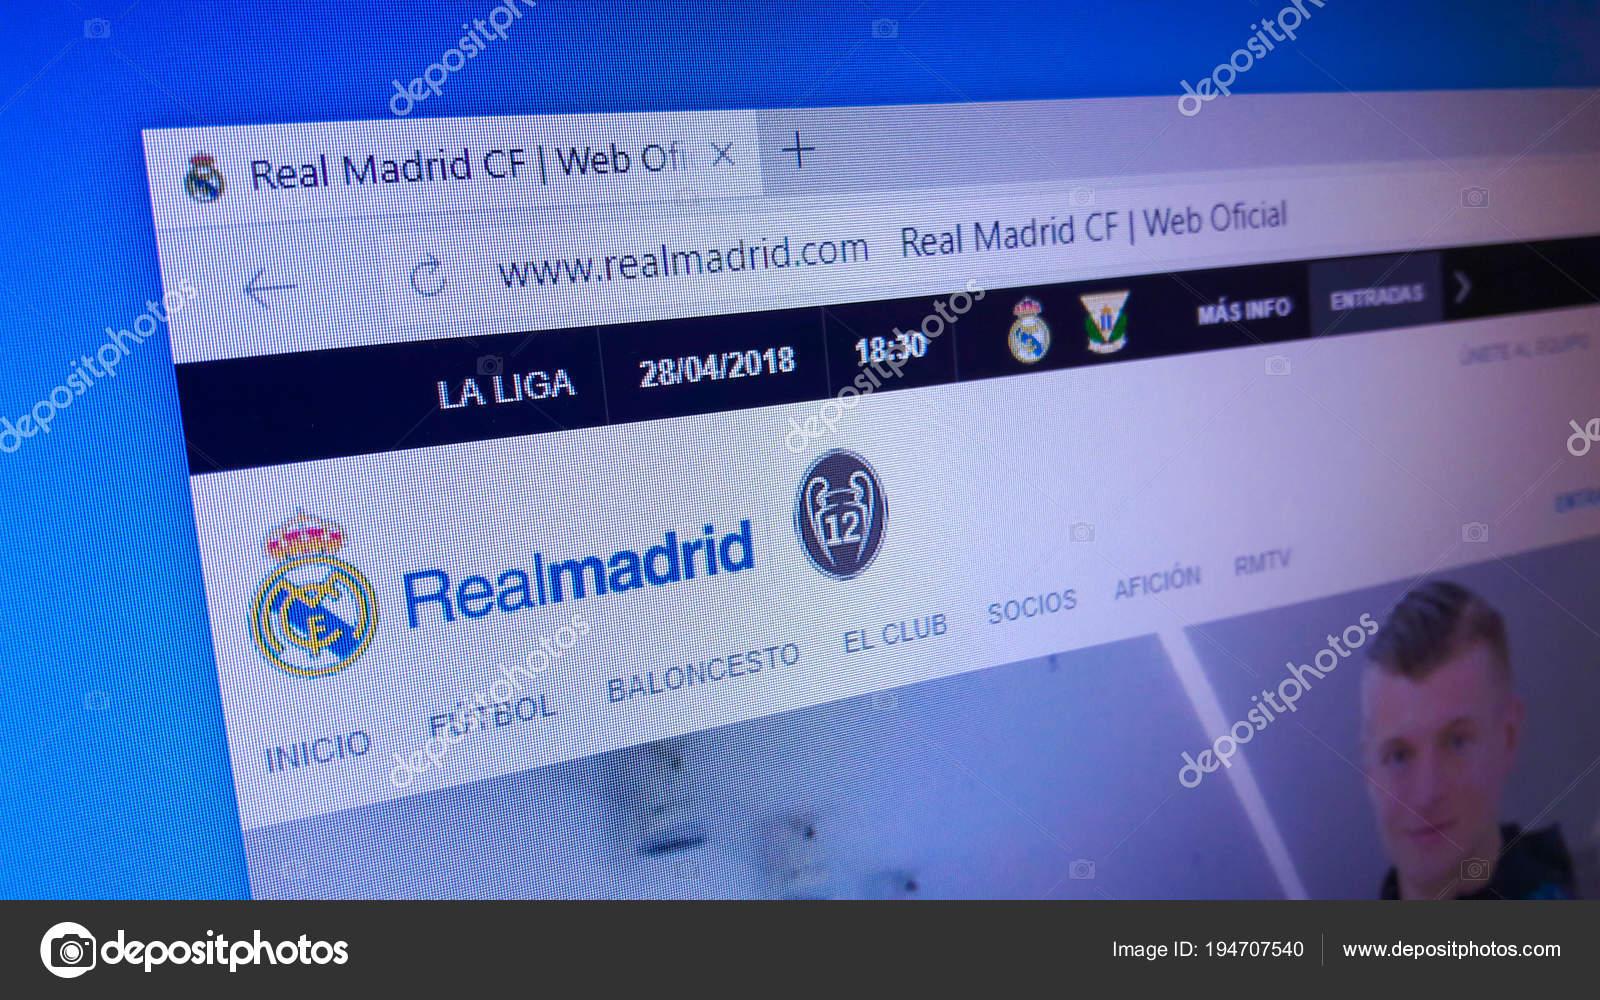 Испанские сайты по футболу